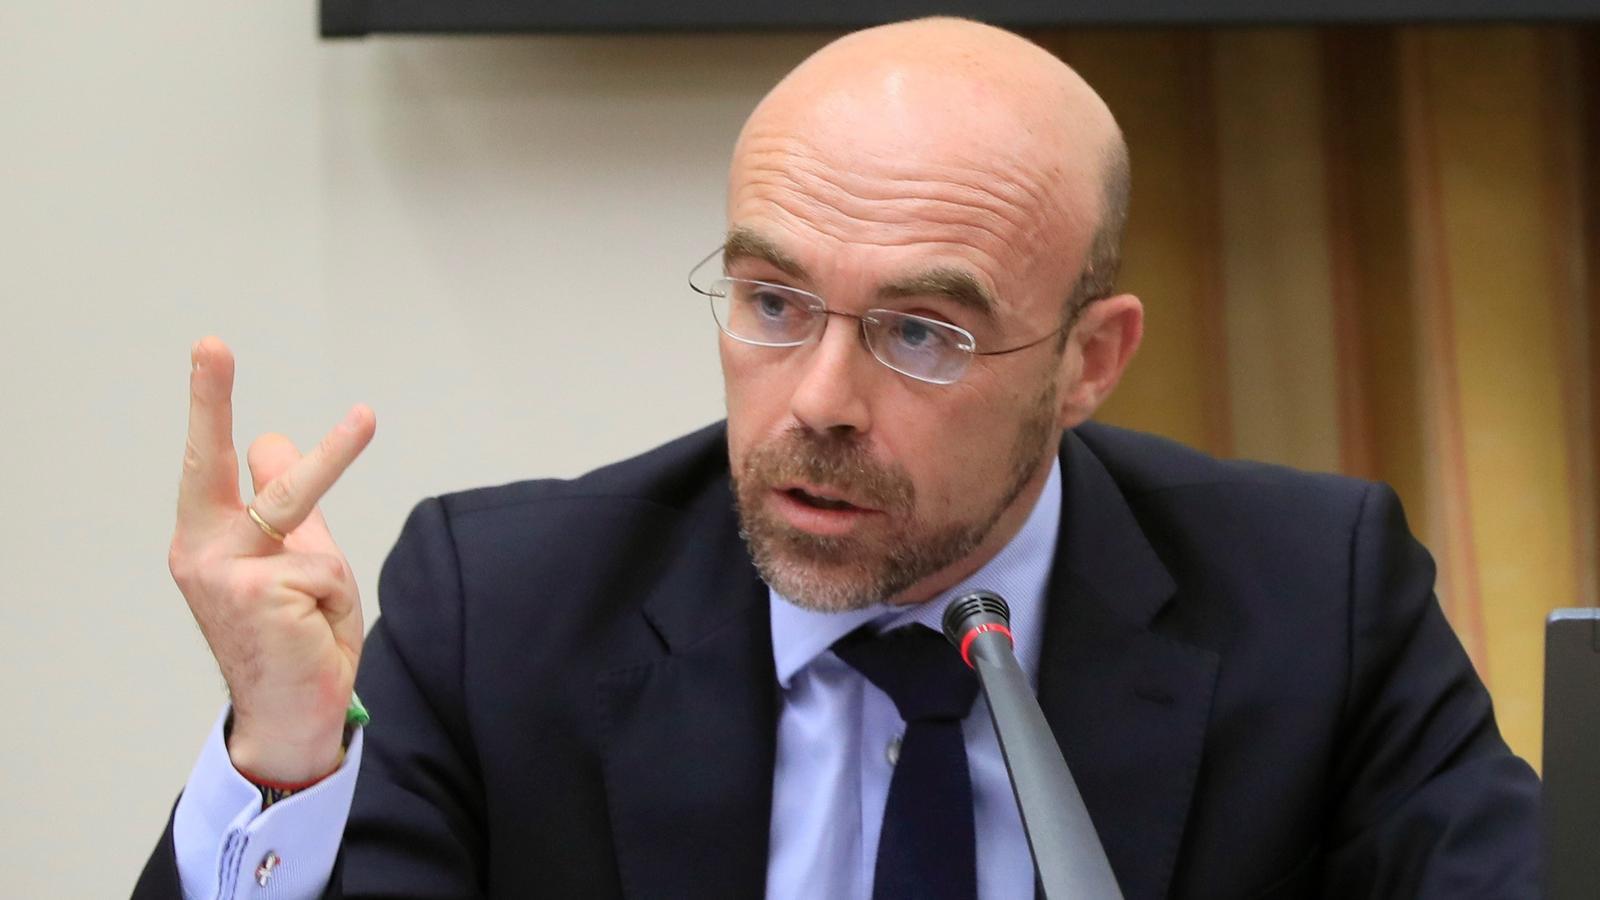 L'eurodiputat de Vox i vicepresident d'Acció Política, Jorge Buxadé.